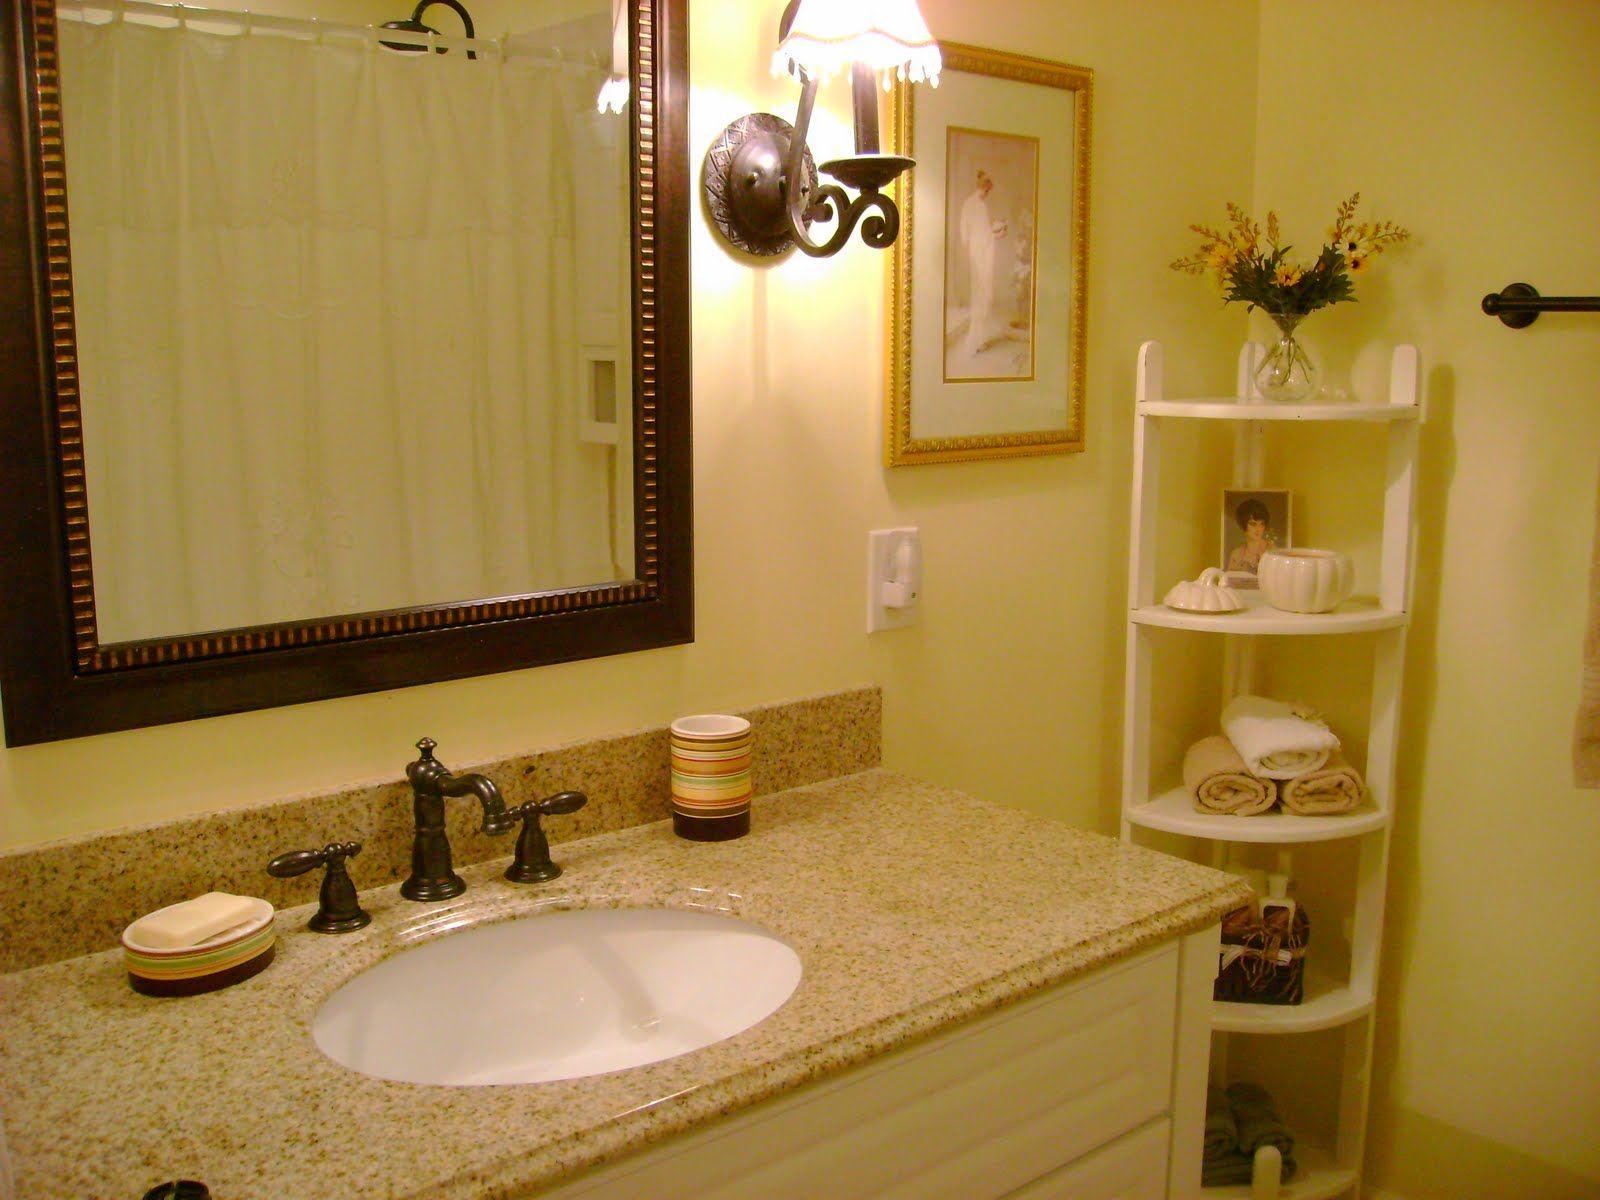 Modern Vintage Victorian Bathroom Vanities With Marble Jambs And ...